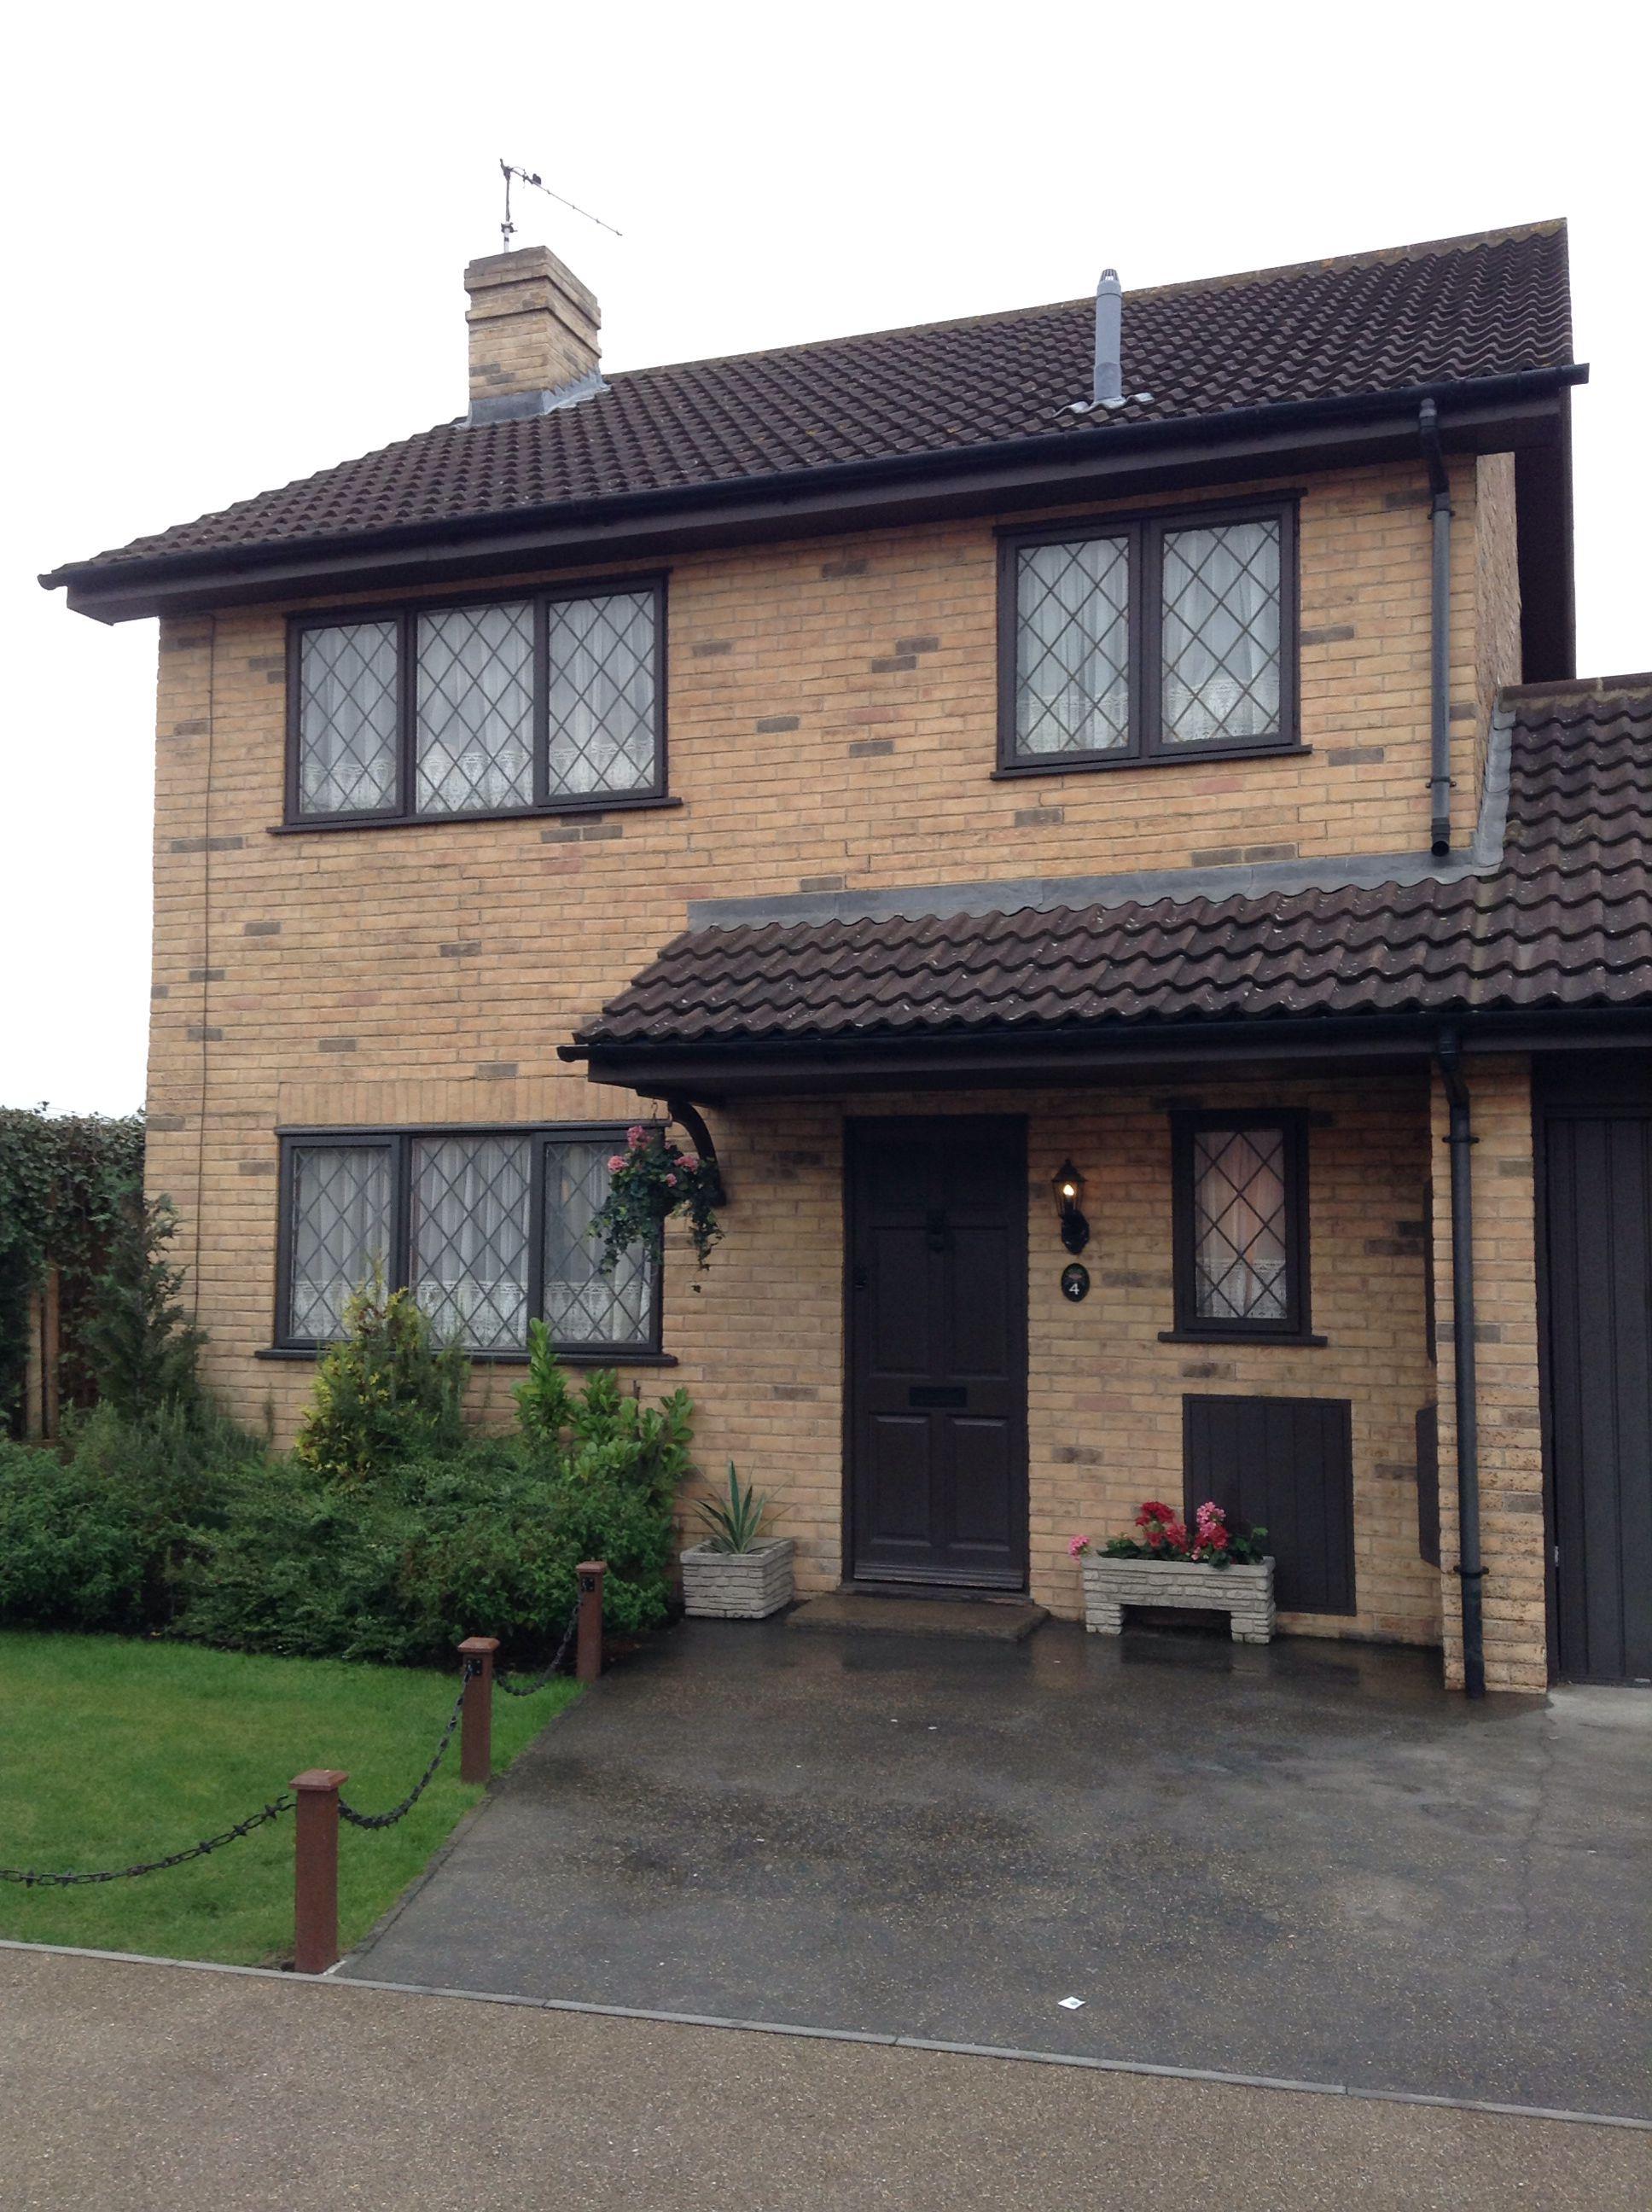 4 Privet Drive Home Of The Dursleys Harrypotter Outdoor Decor Harry Potter Studio Tour Studio Tour